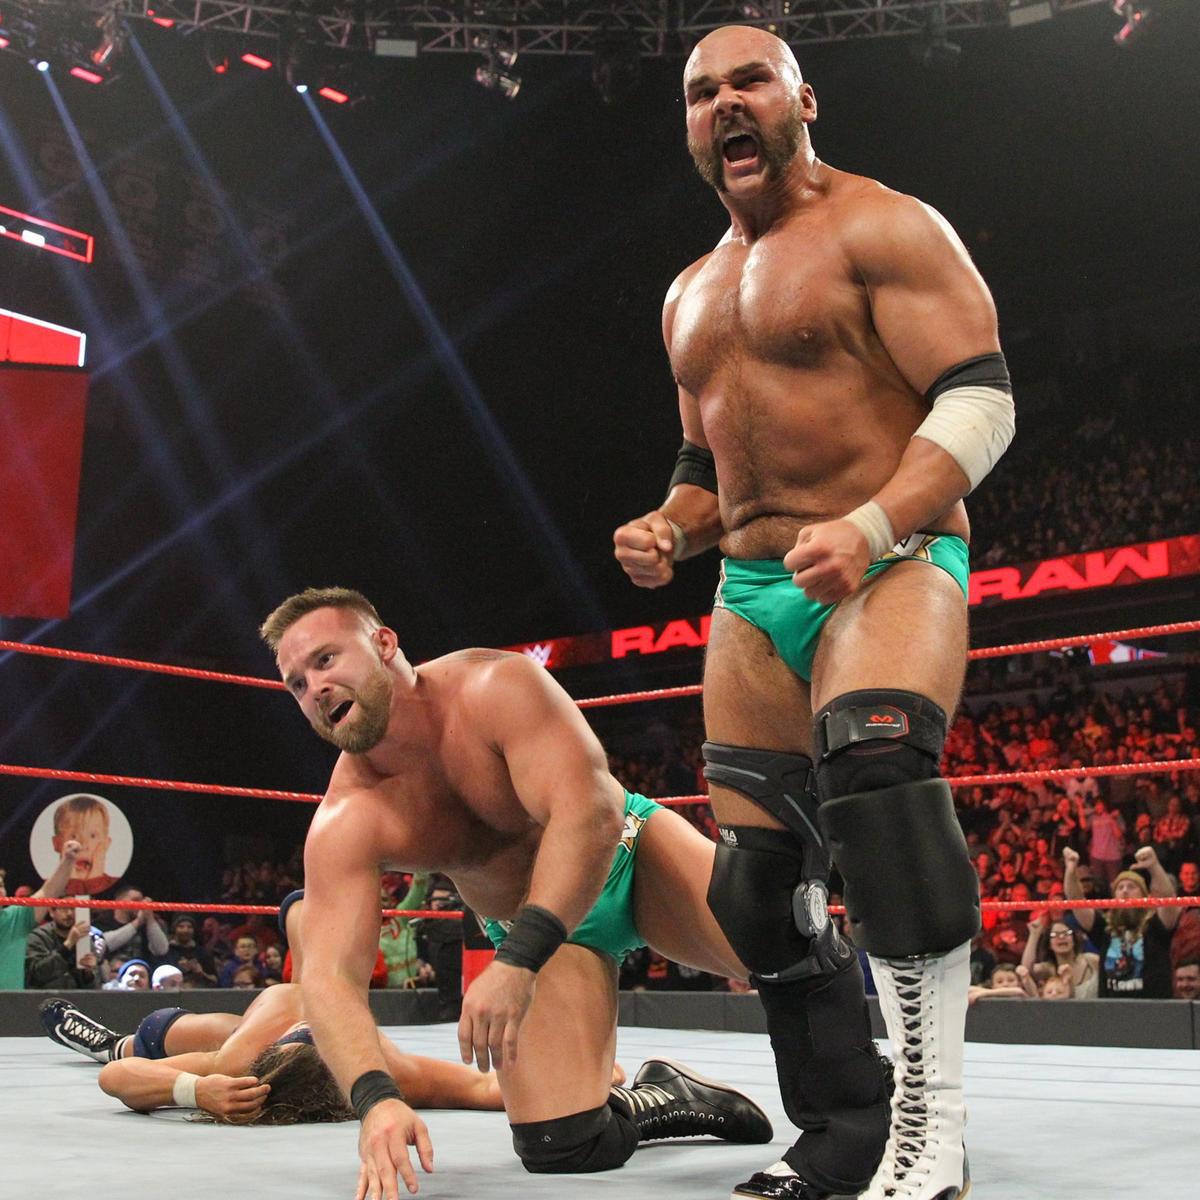 Dash & Dawson are the new Raw Tag Team Champions!